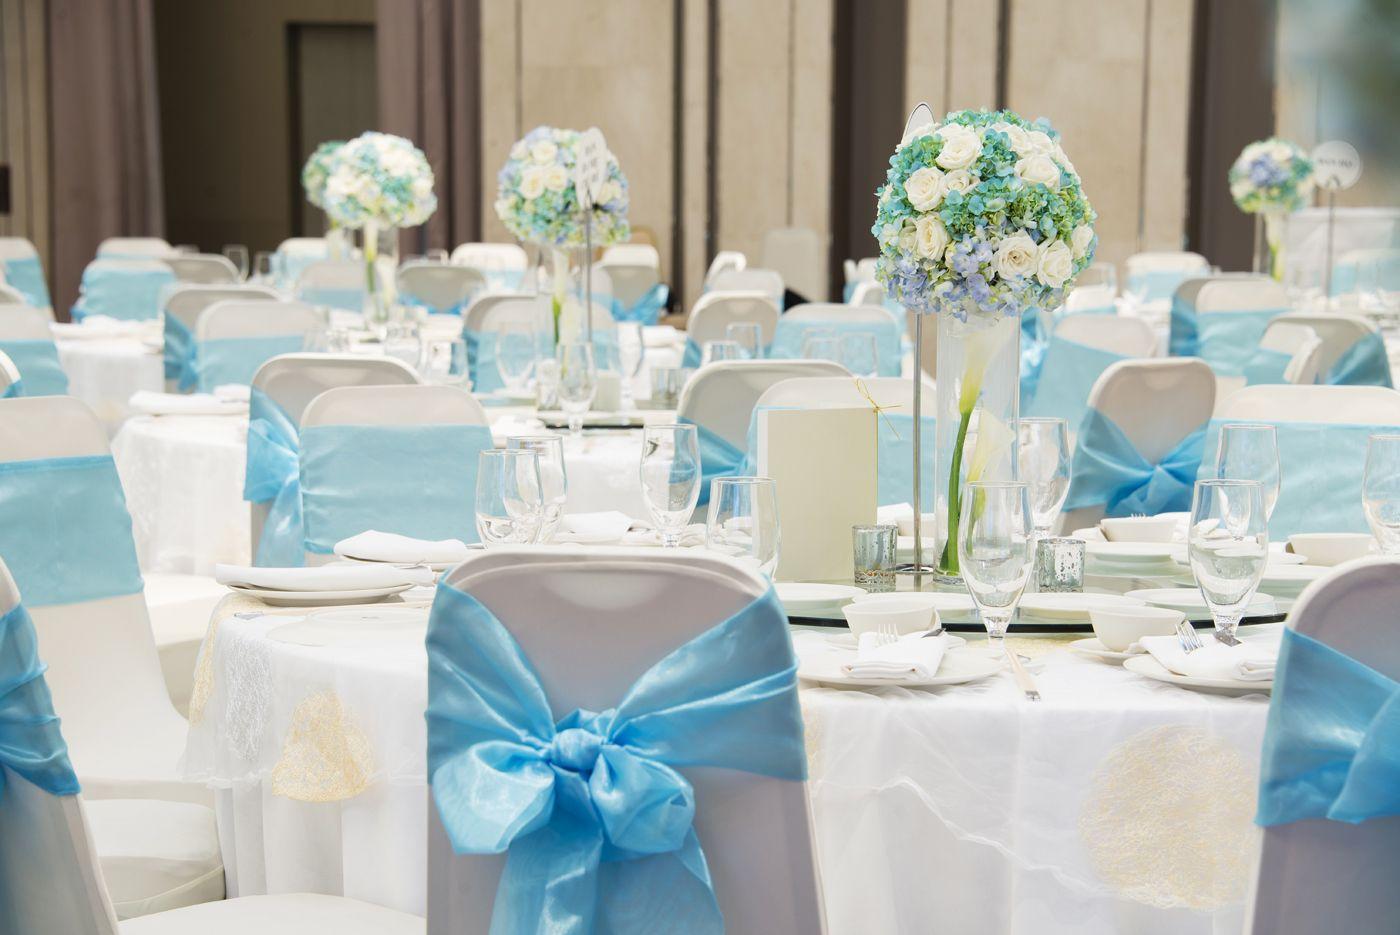 Pleasant Sky Blue Themed Wedding Decoration Wedding Decoration Download Free Architecture Designs Sospemadebymaigaardcom